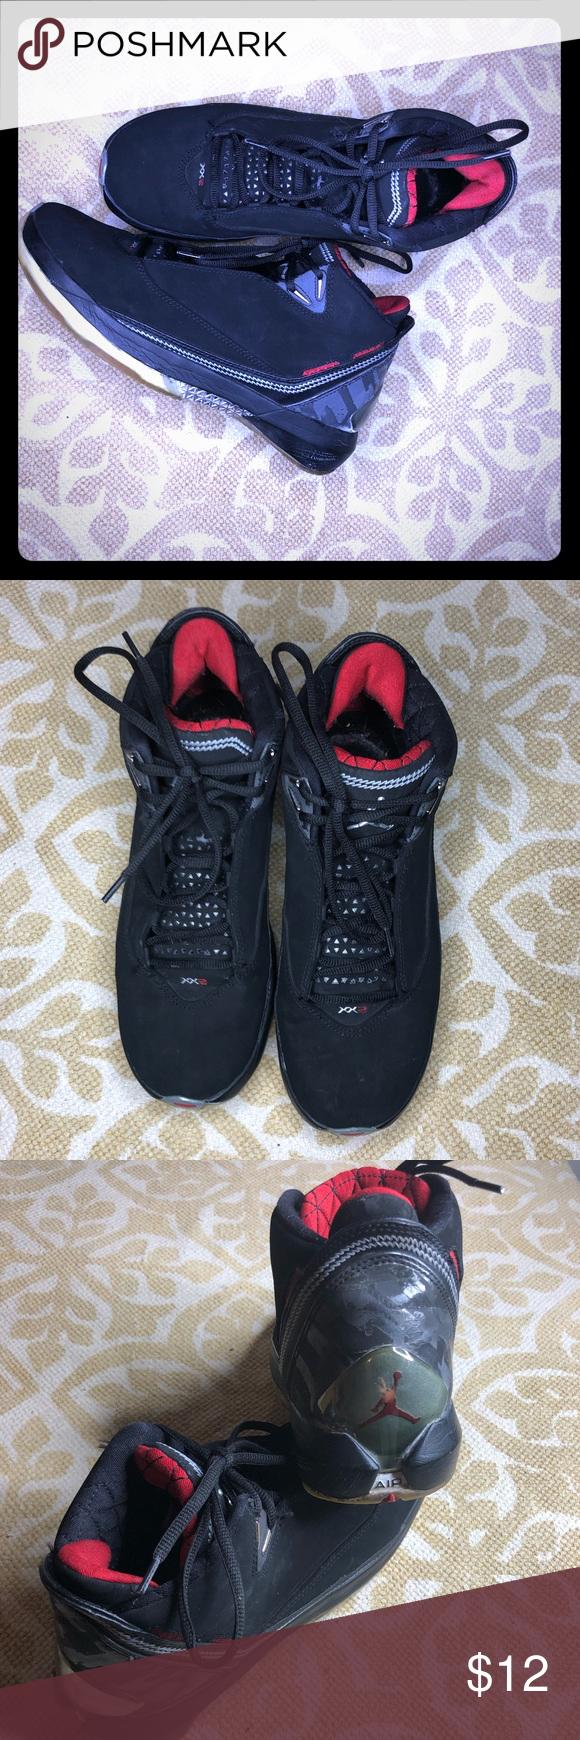 uk availability fedb5 9e603 Nike air Jordan XX2 NIKE AIR JORDAN XX2 22 BLACK VARSITY RED METALLIC  SILVER 315299-